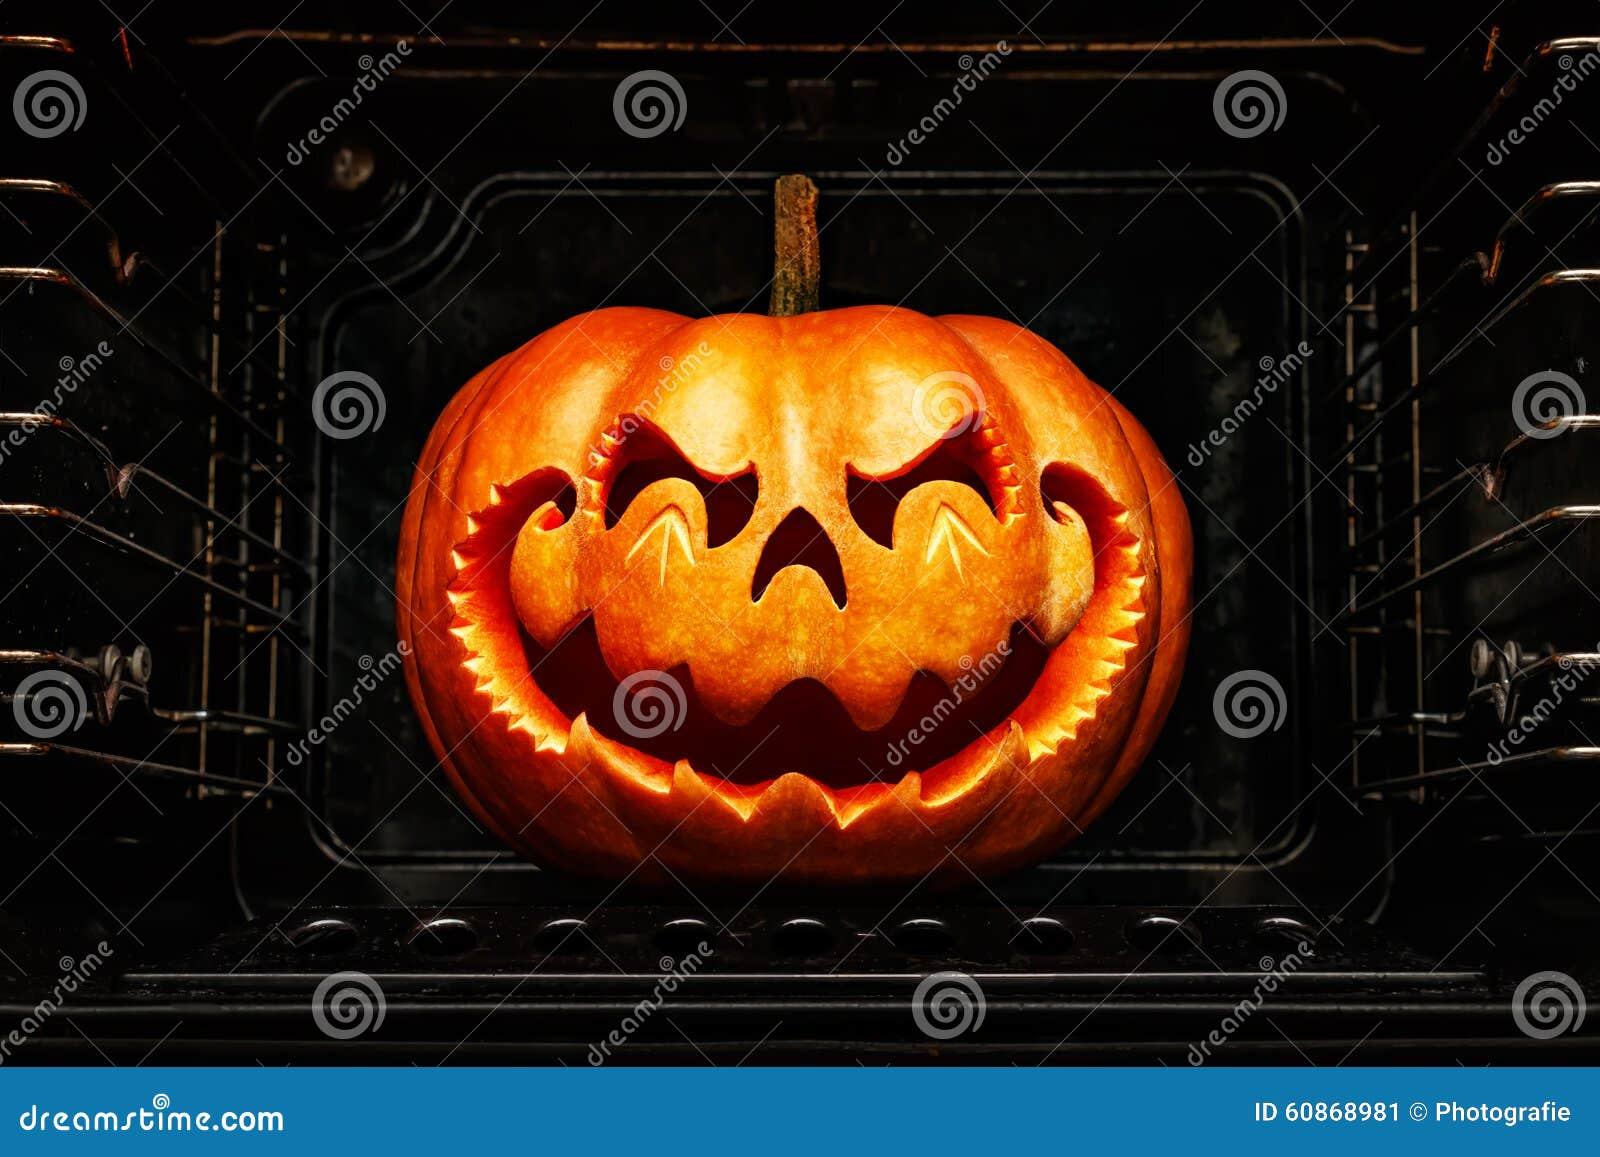 funny halloween pumpkin resembling a chinese dragon head, roast